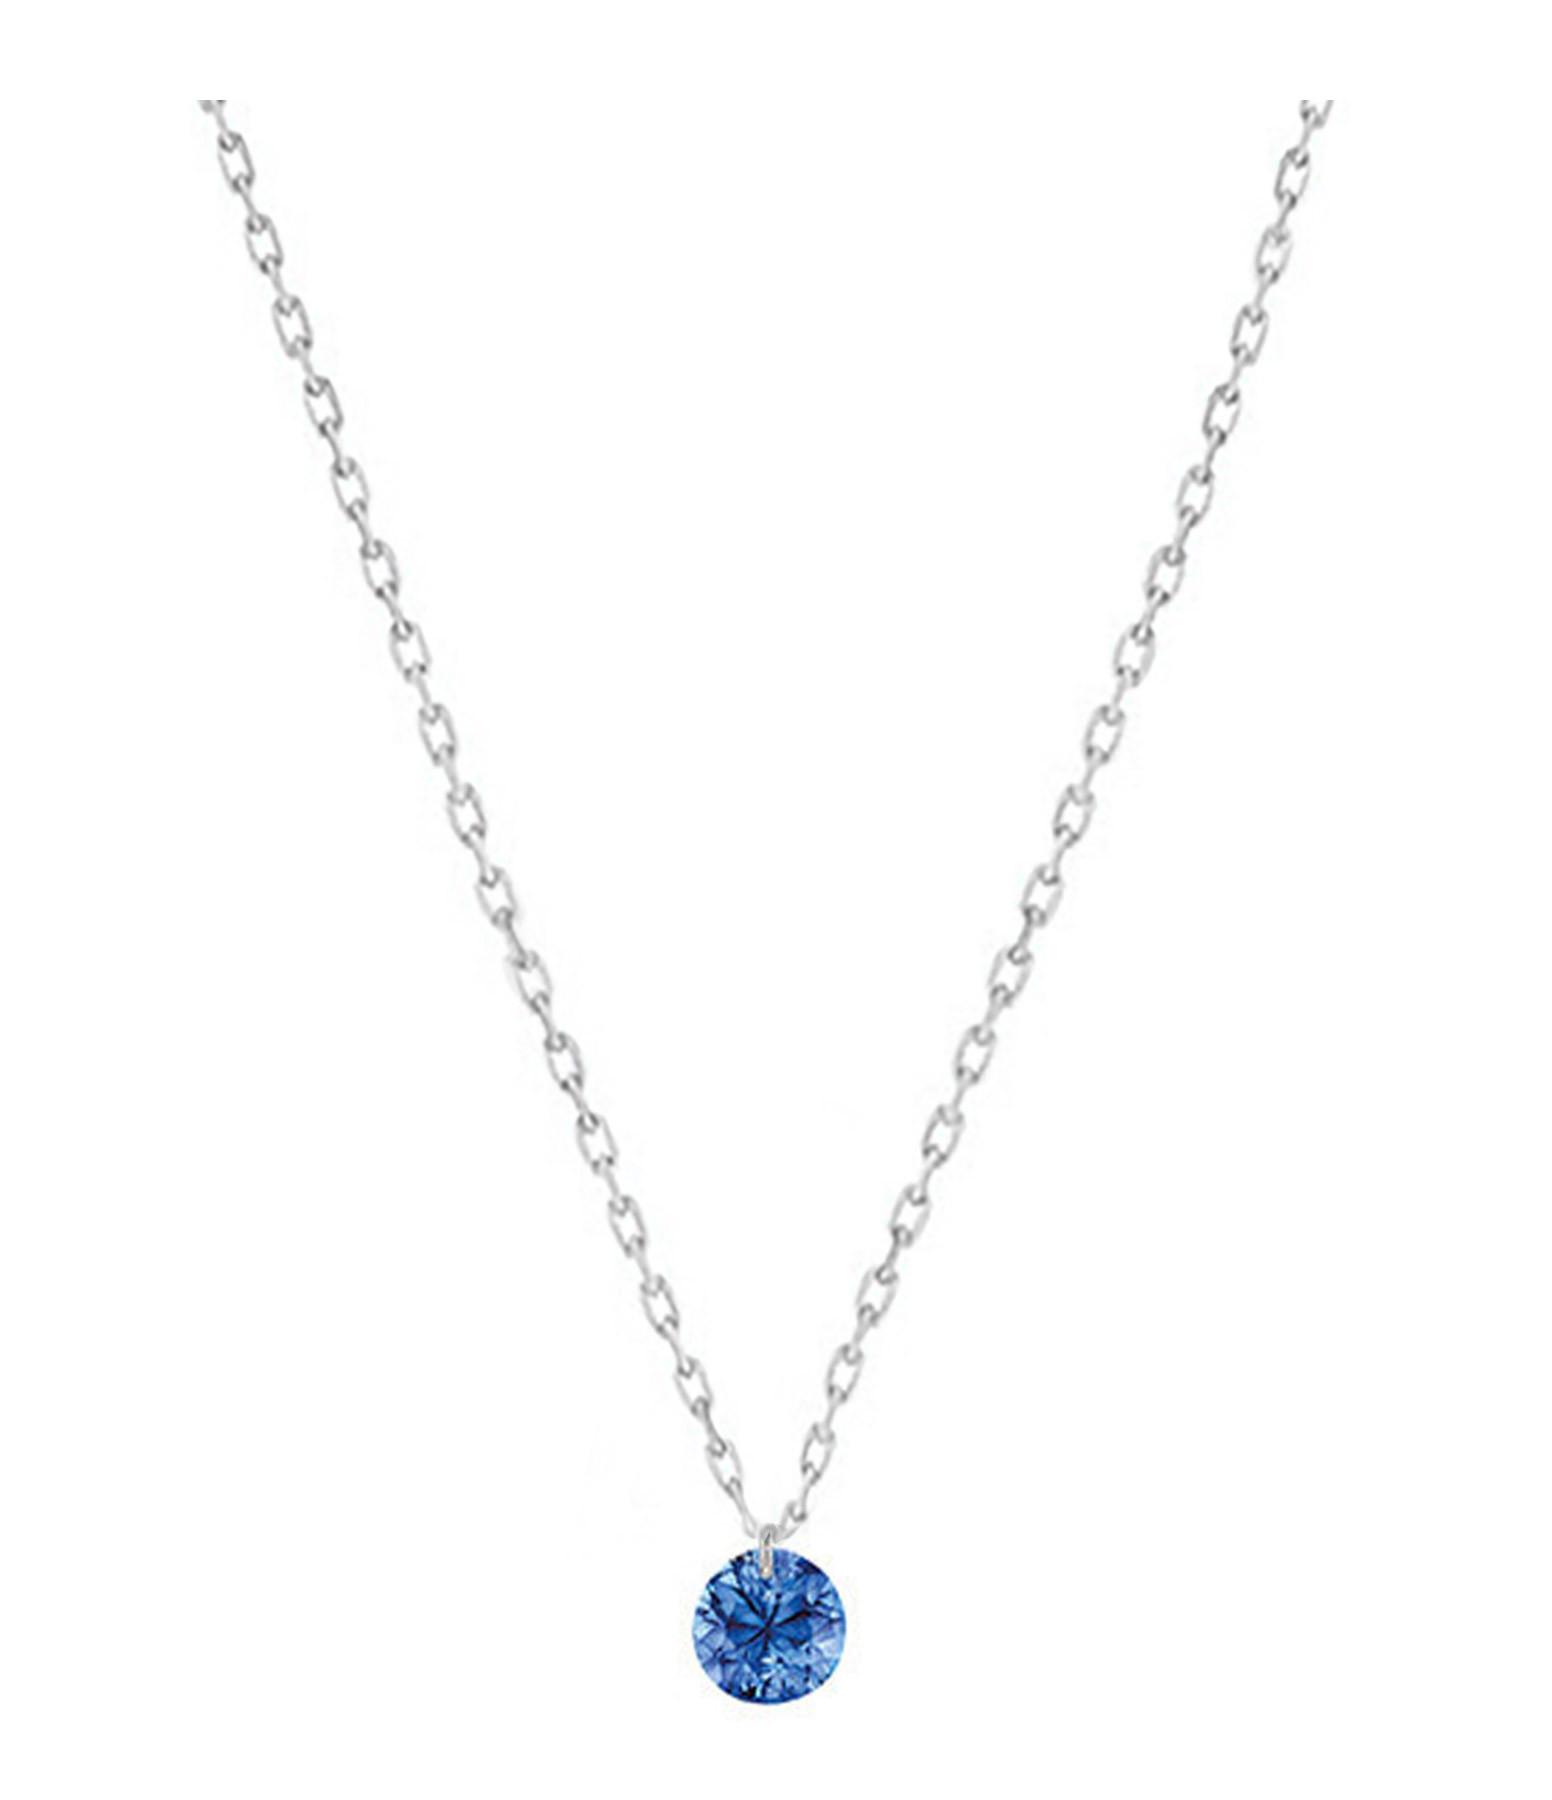 LA BRUNE & LA BLONDE - Collier Confetti Saphir Bleu Or Blanc